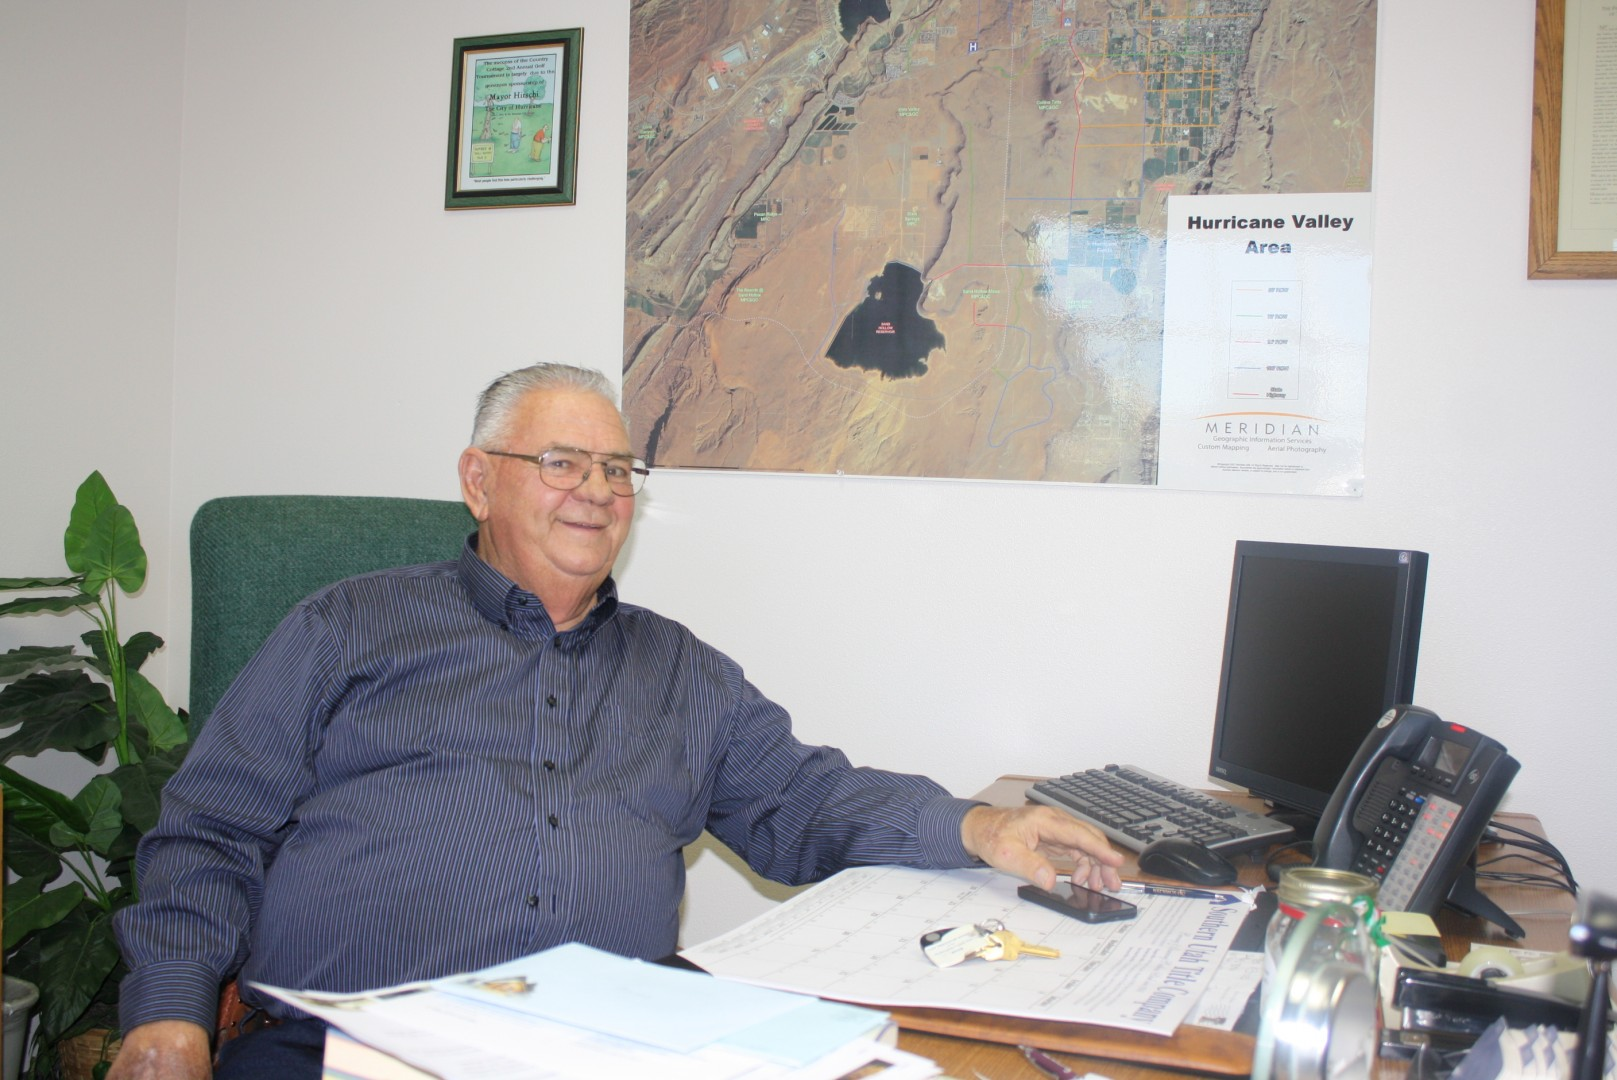 Mayor Tom Hirschi, Hurricane, Utah, Dec. 13, 2013 | Photo by Reuben Wadsworth, St. George News